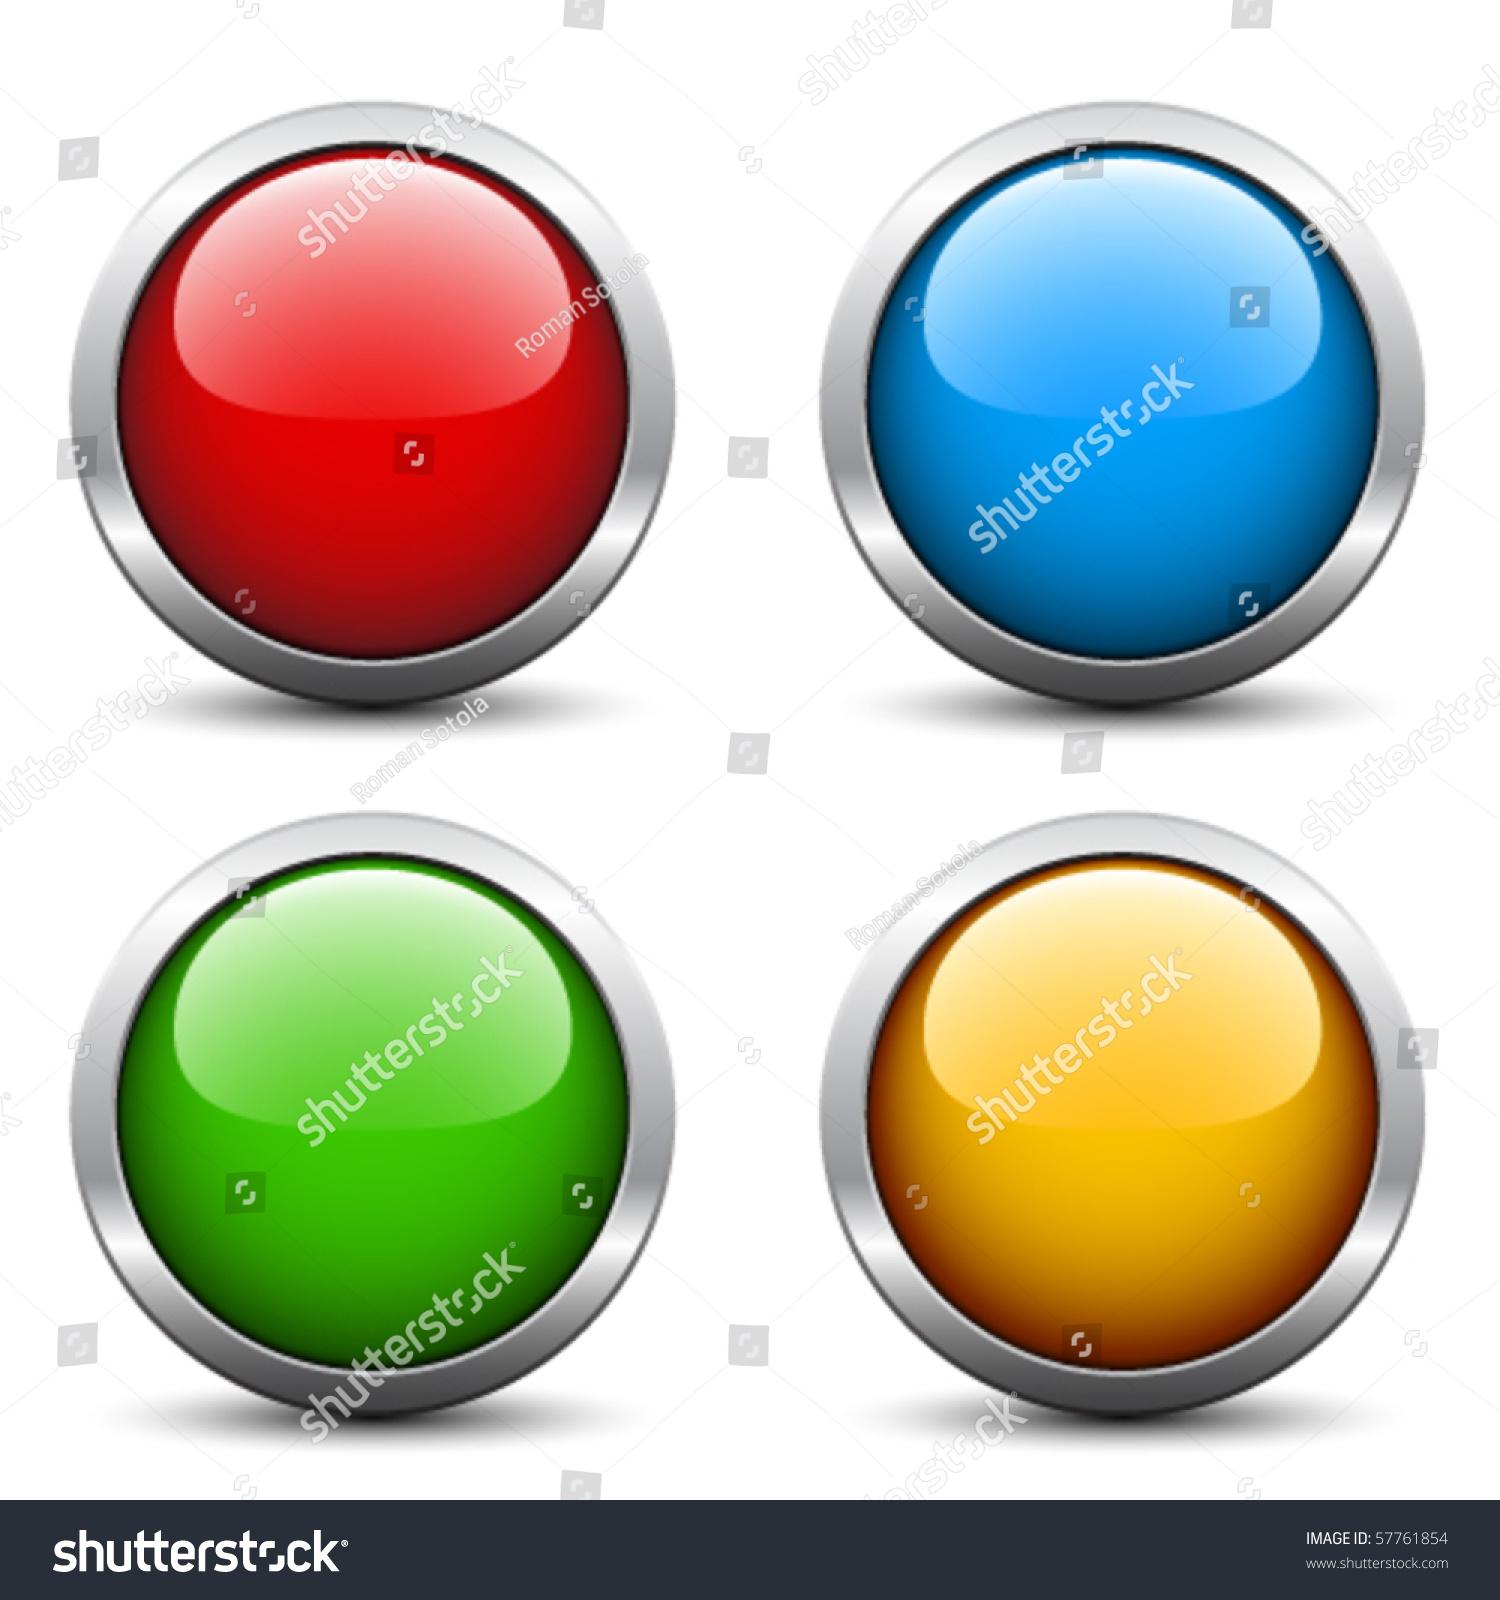 Vector Glossy Buttons Stock Vector 57761854 - Shutterstock